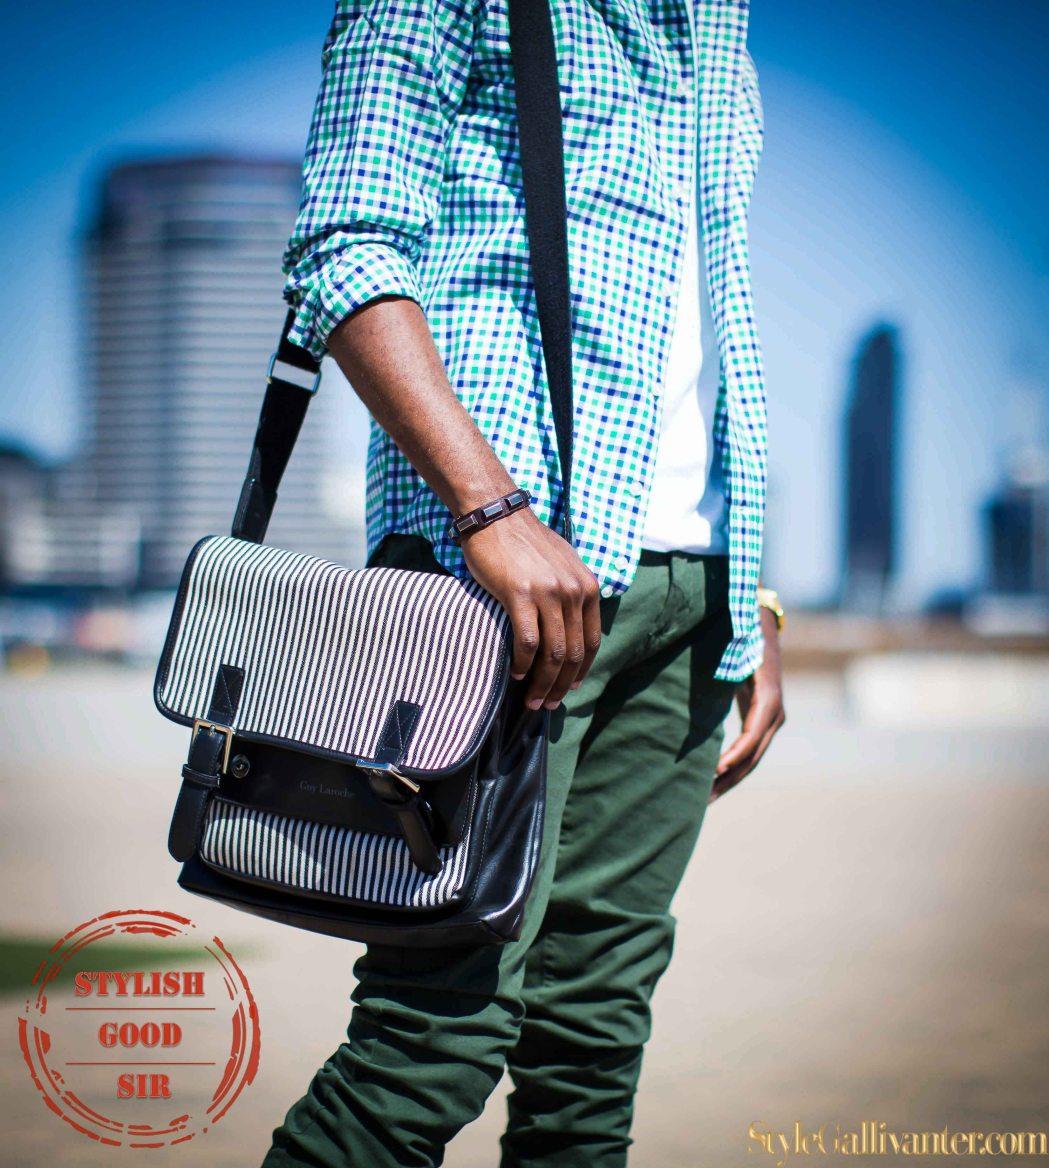 stylish-good-sir_top-menswear-blogs-melbourne-australia_melbourne's-top-menswear-blogs_mens-fashion-melbourne_high-fashion-men_australias-best-menswear-blogs-28